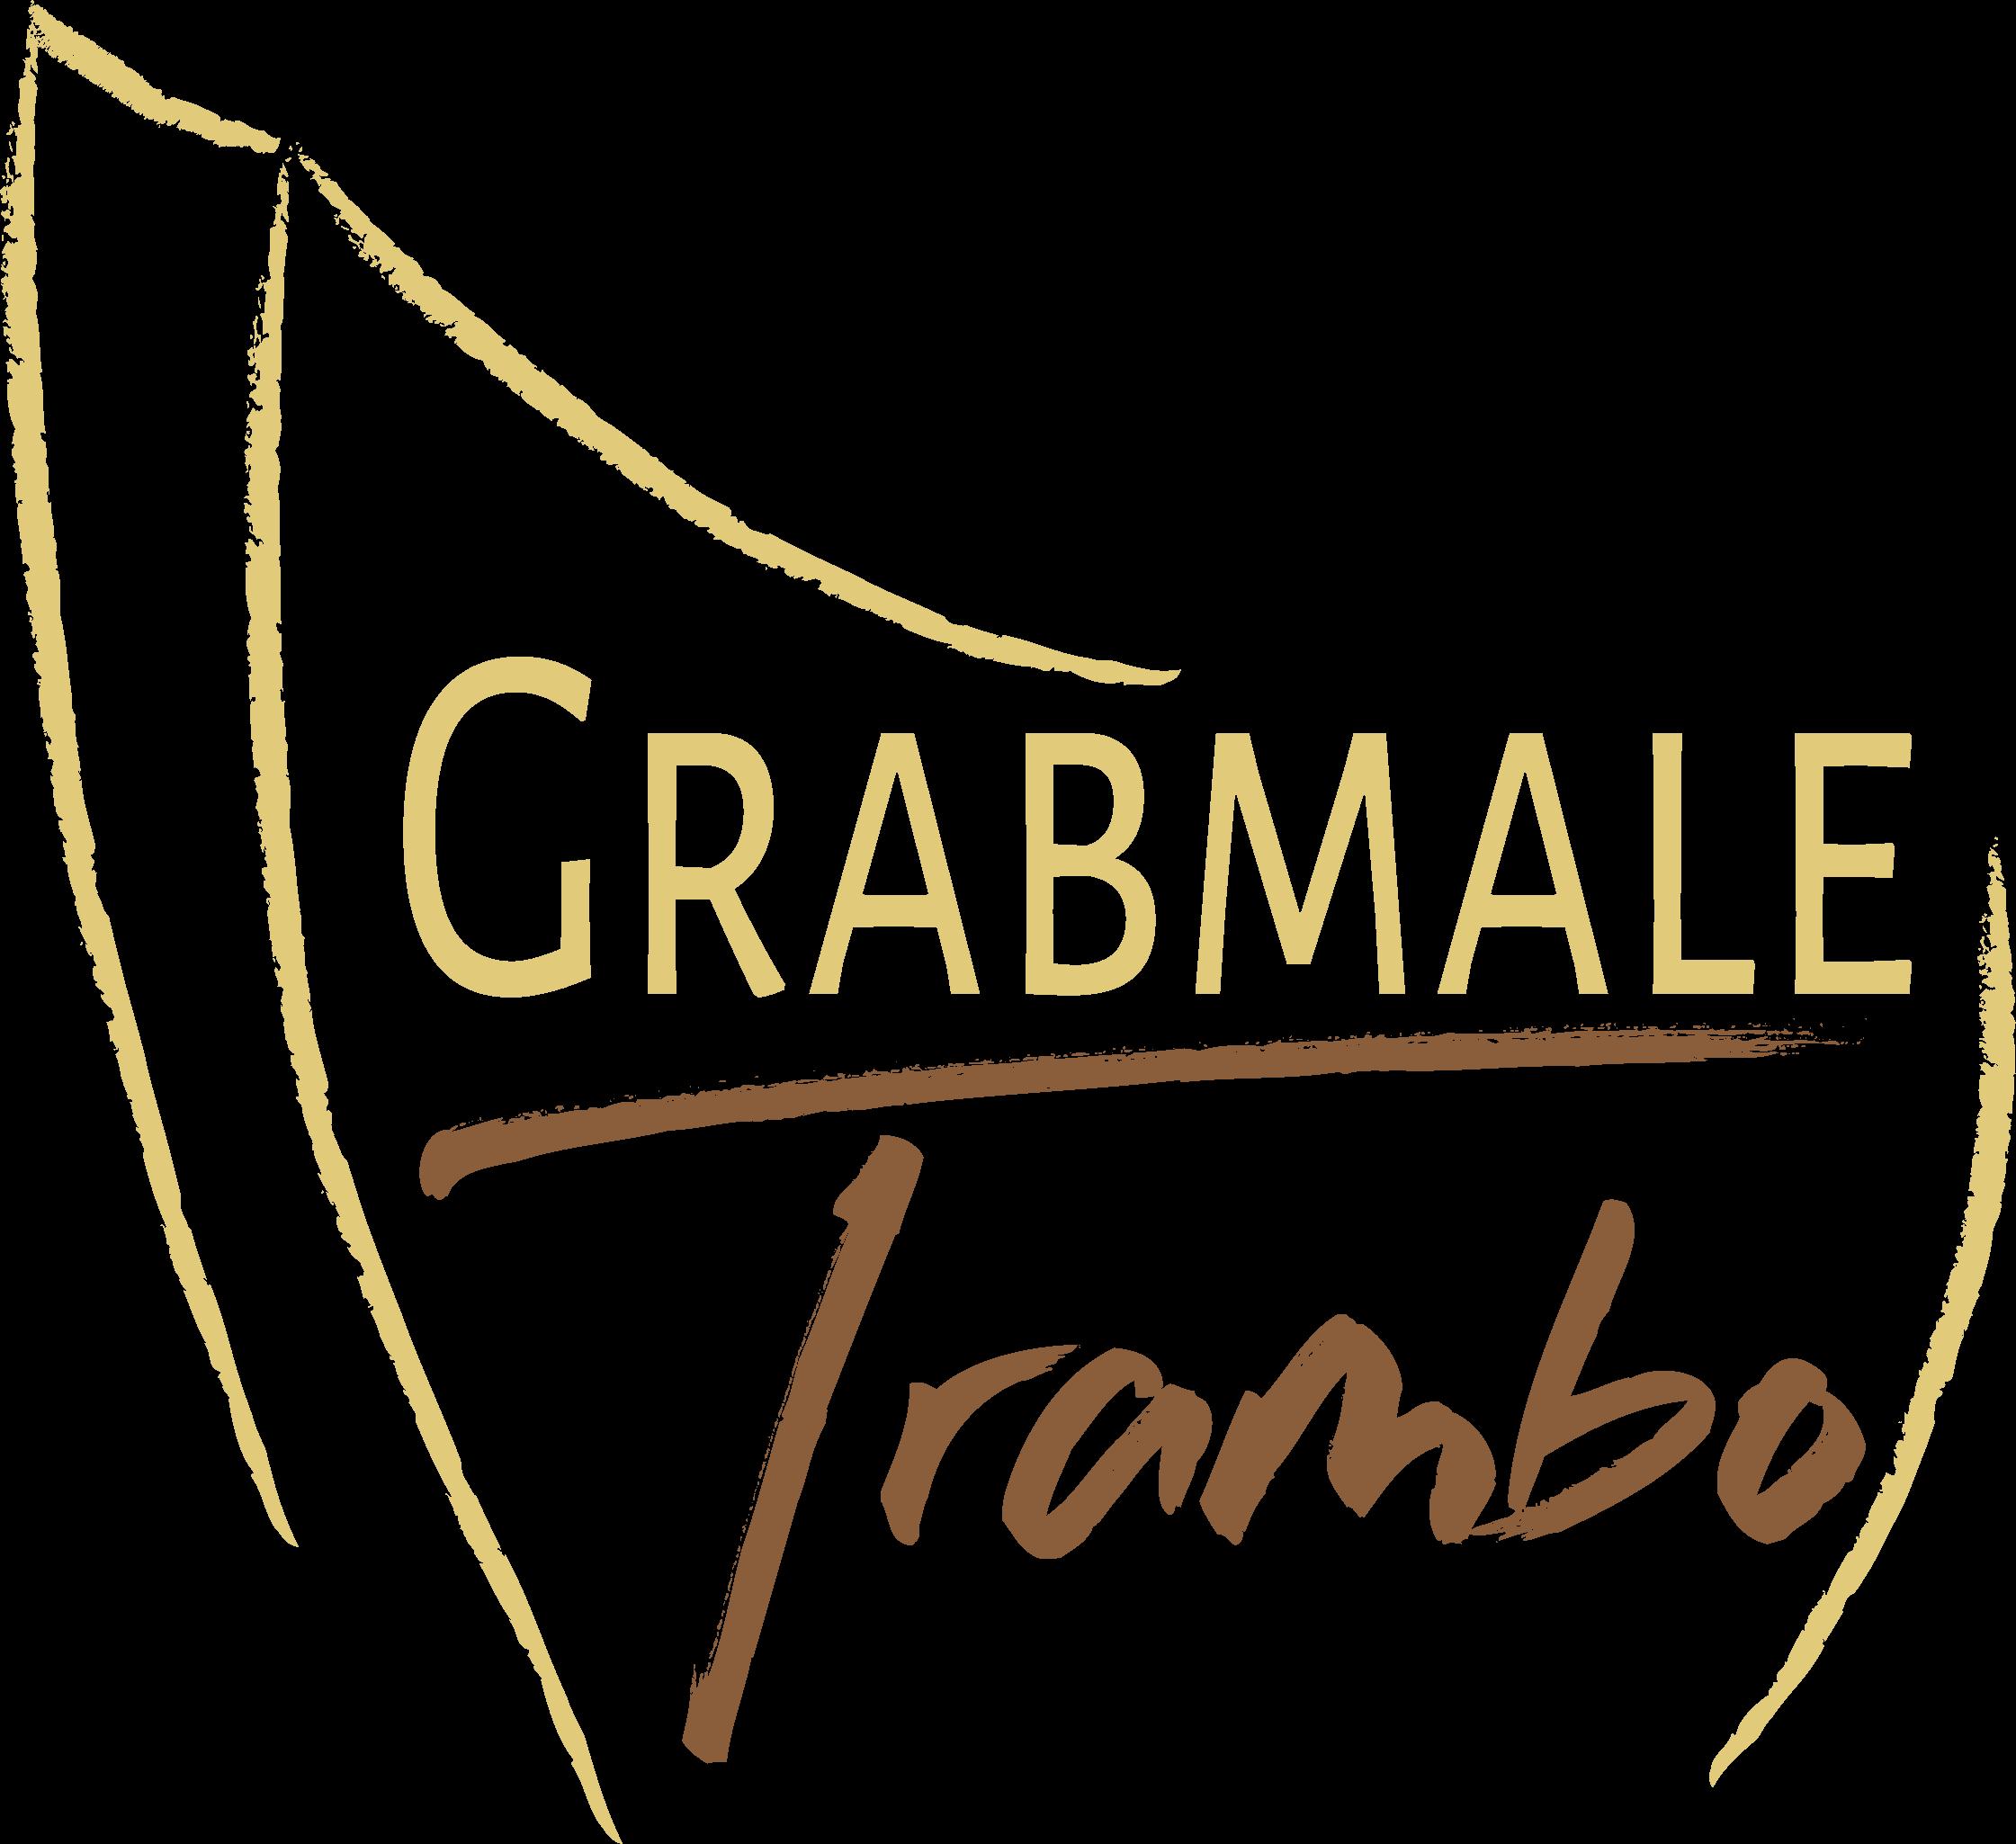 Grabmale Trambo